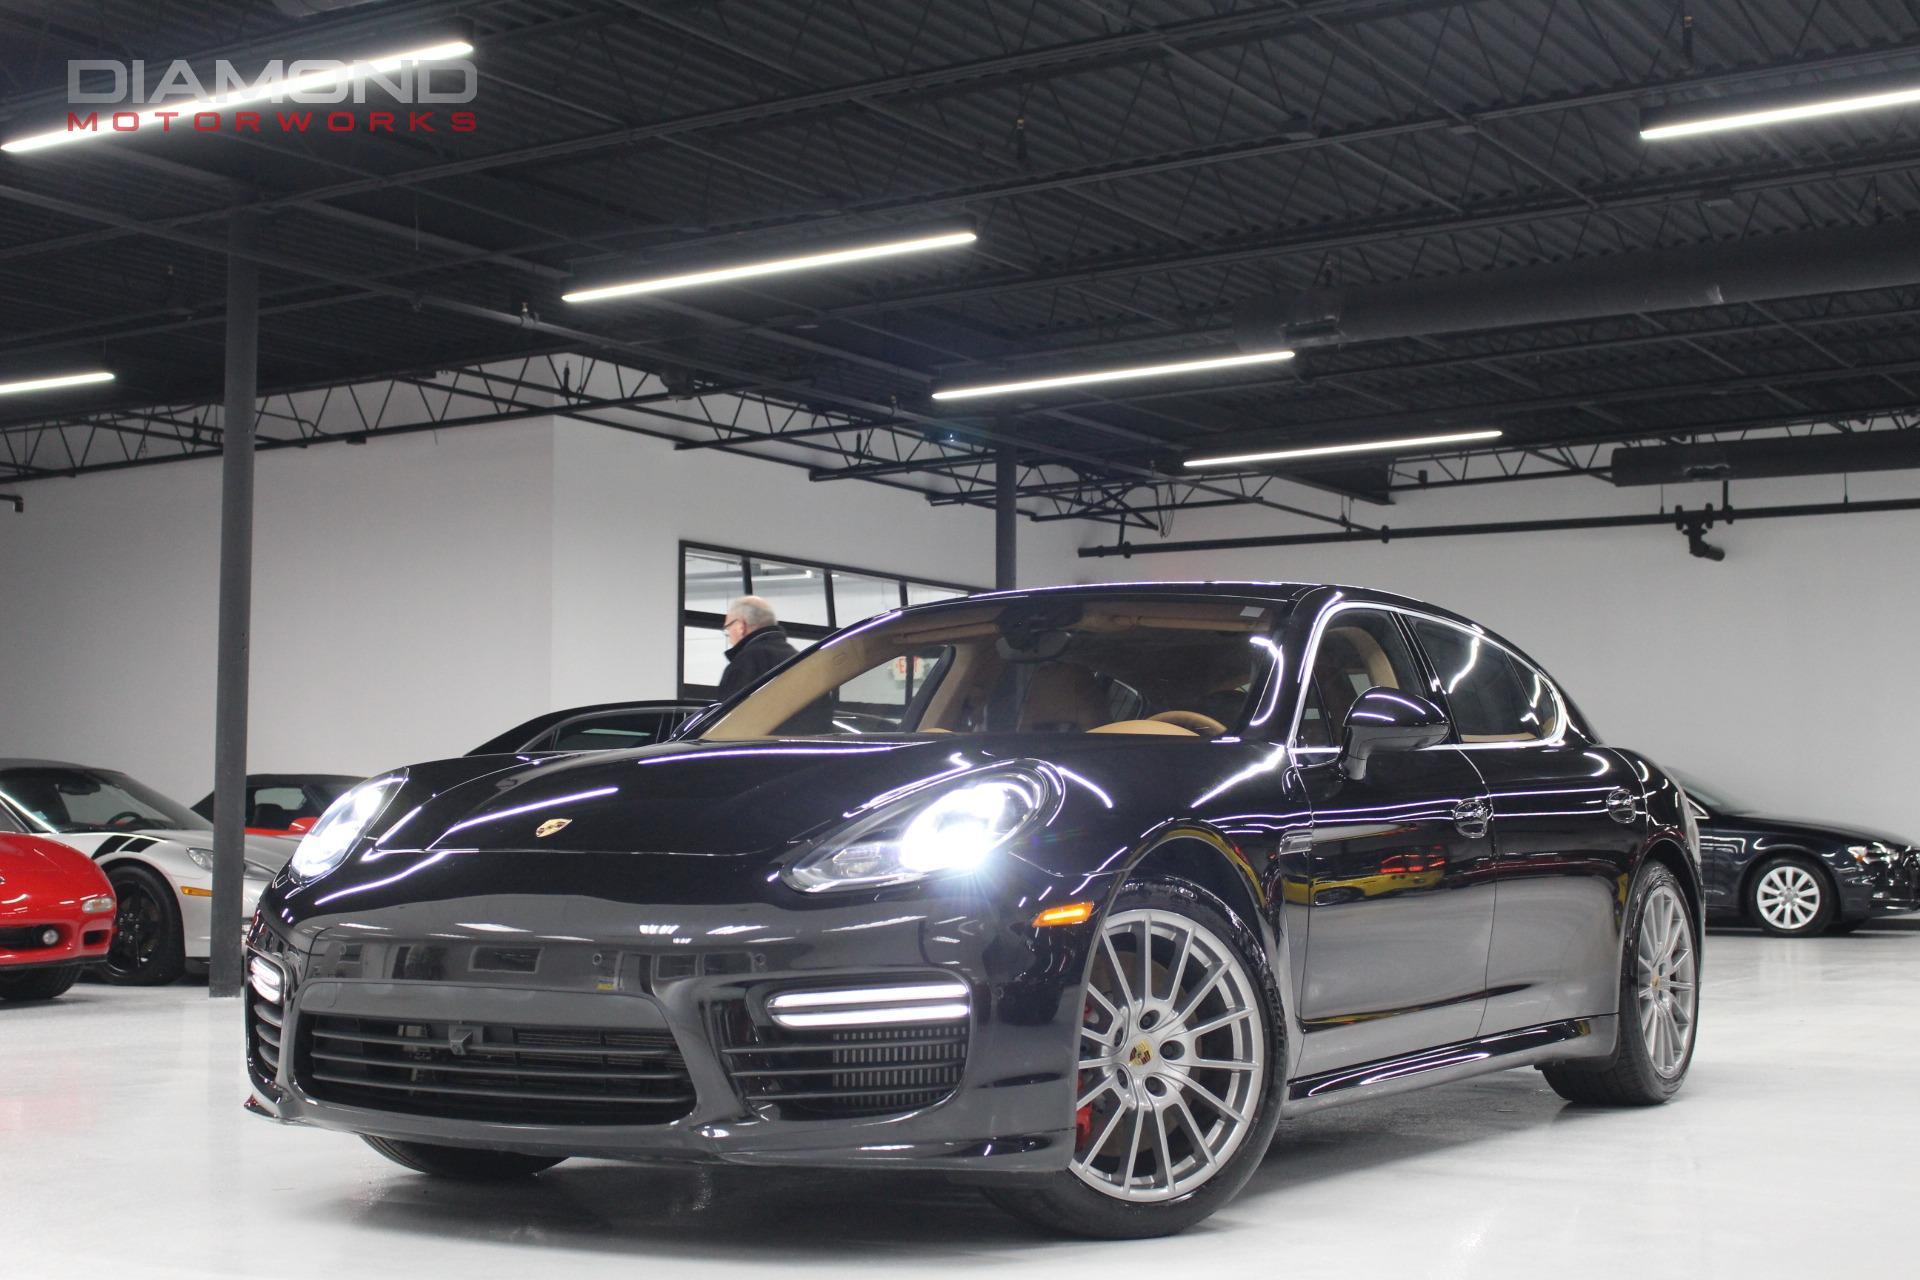 2014 porsche panamera 4dr hatchback turbo executive stock 077348 used 2014 porsche panamera 4dr hatchback turbo executive lisle il sciox Gallery